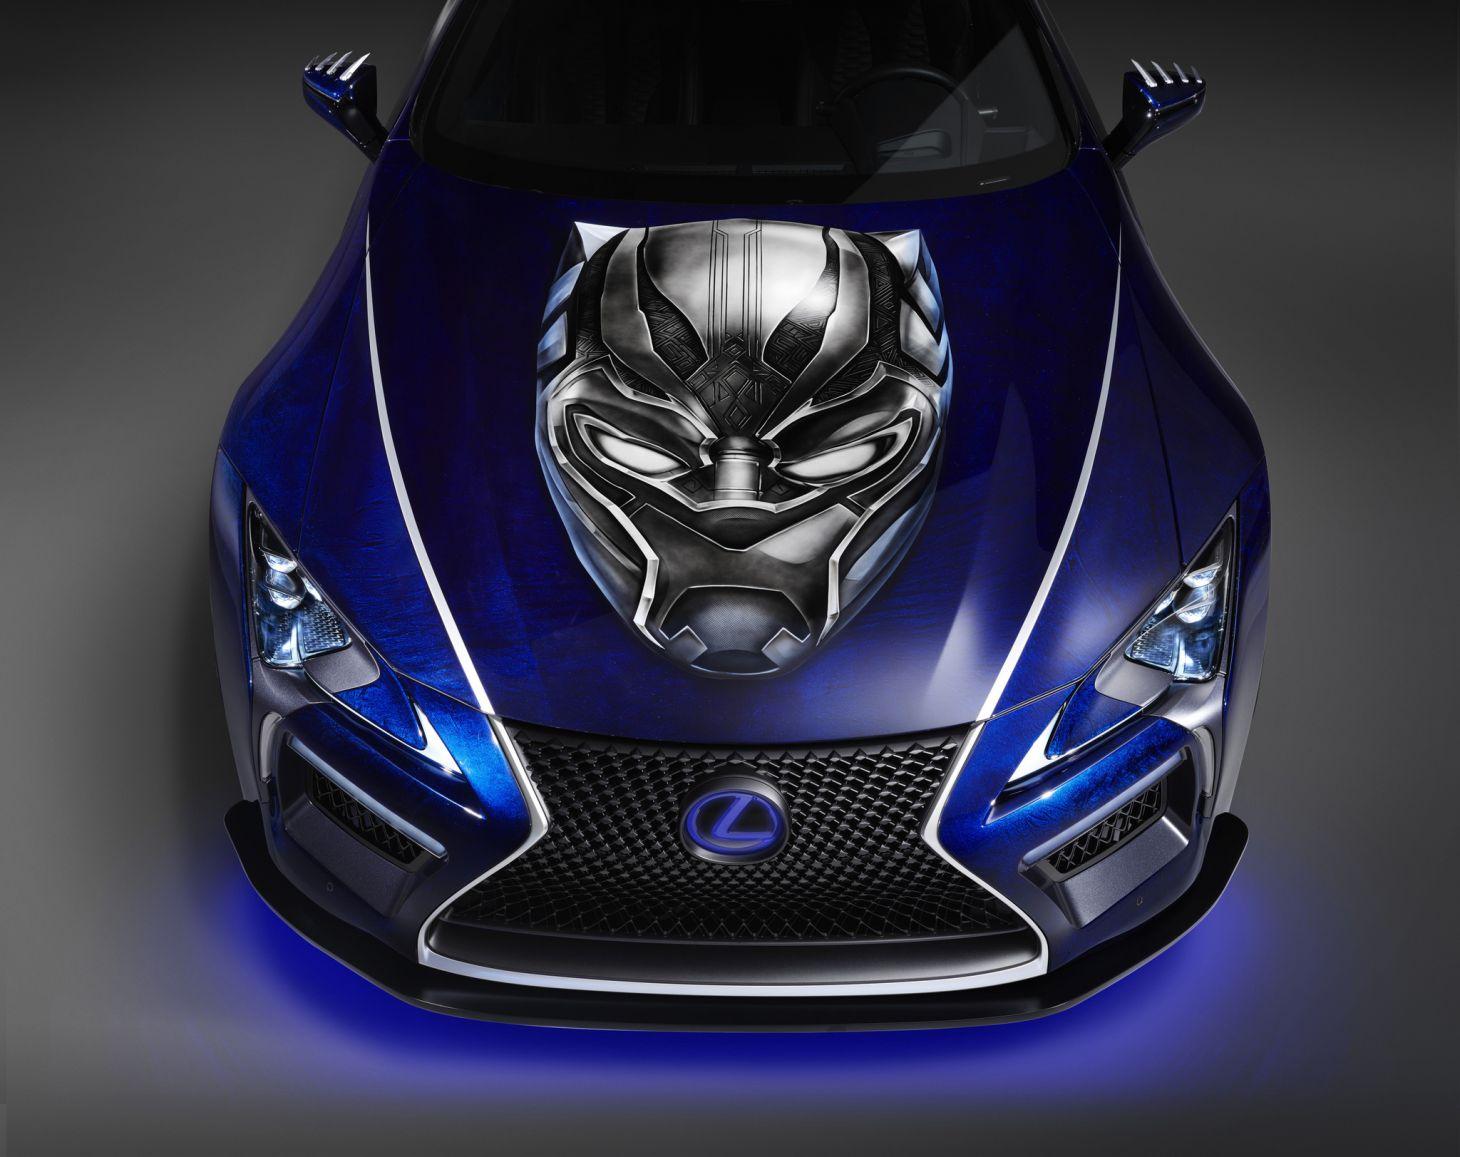 lexus_black_panther_inspired_lc_500_dianteira Carro do Pantera Negra: conheça o futurista Lexus LC 500